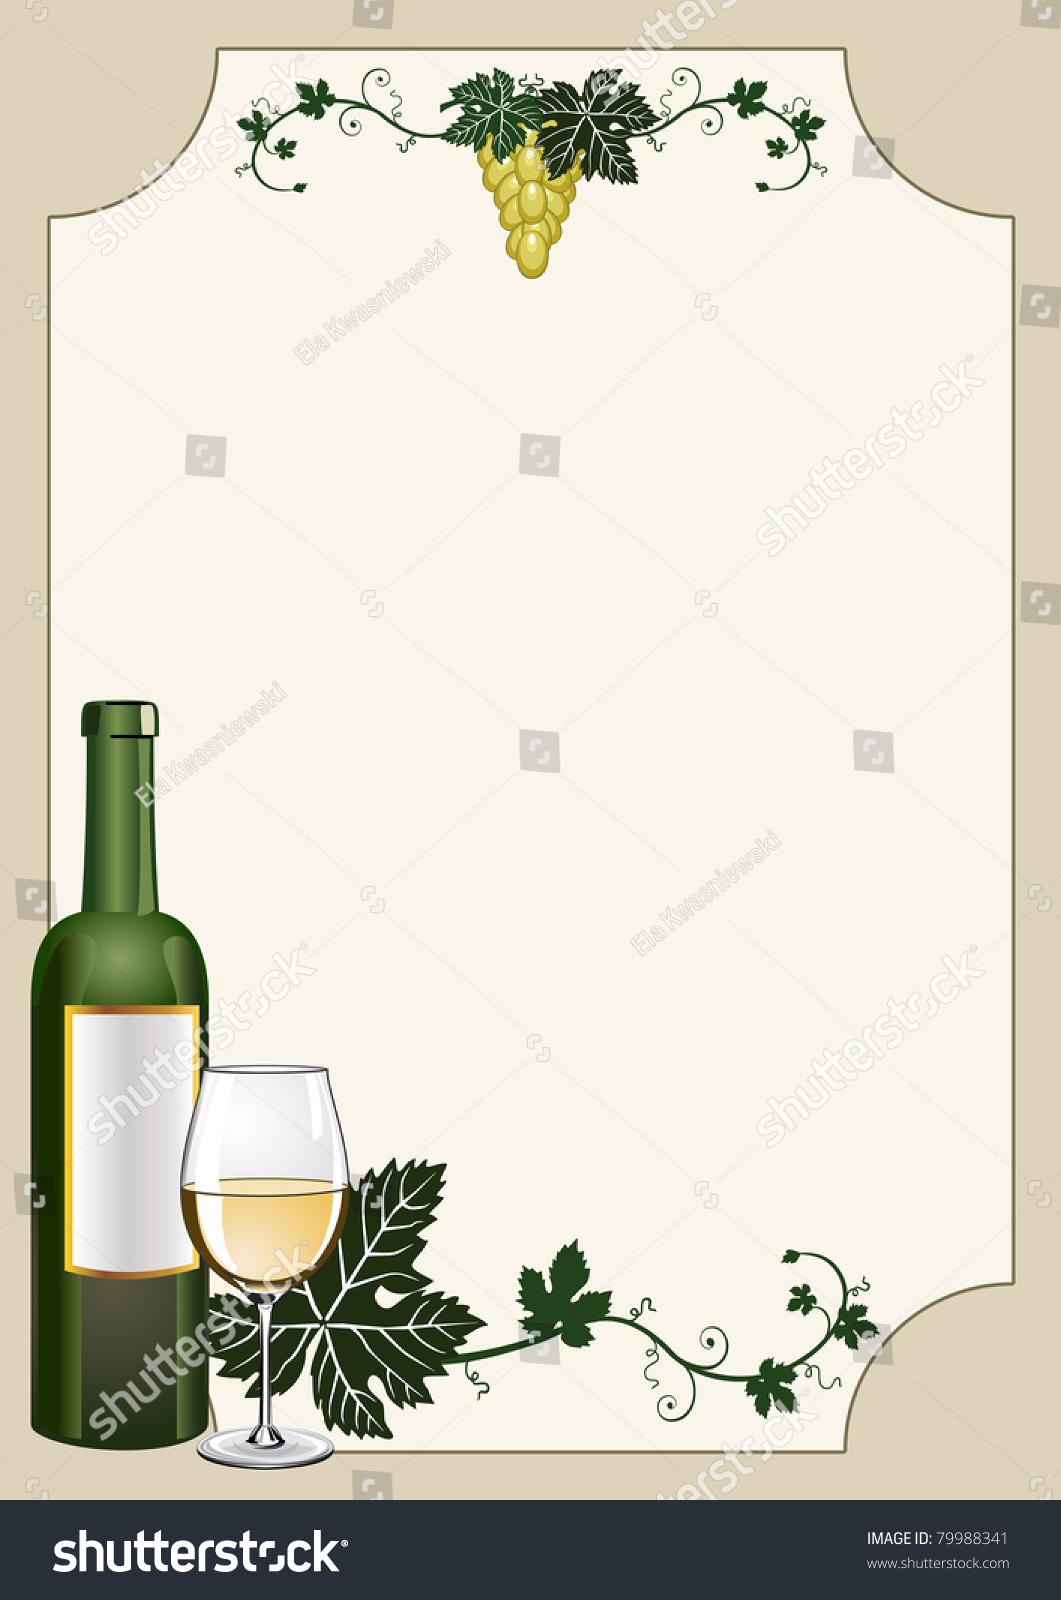 wine shield card background restaurant menu stock vector wine glass graphic logo wine glass vector graphics